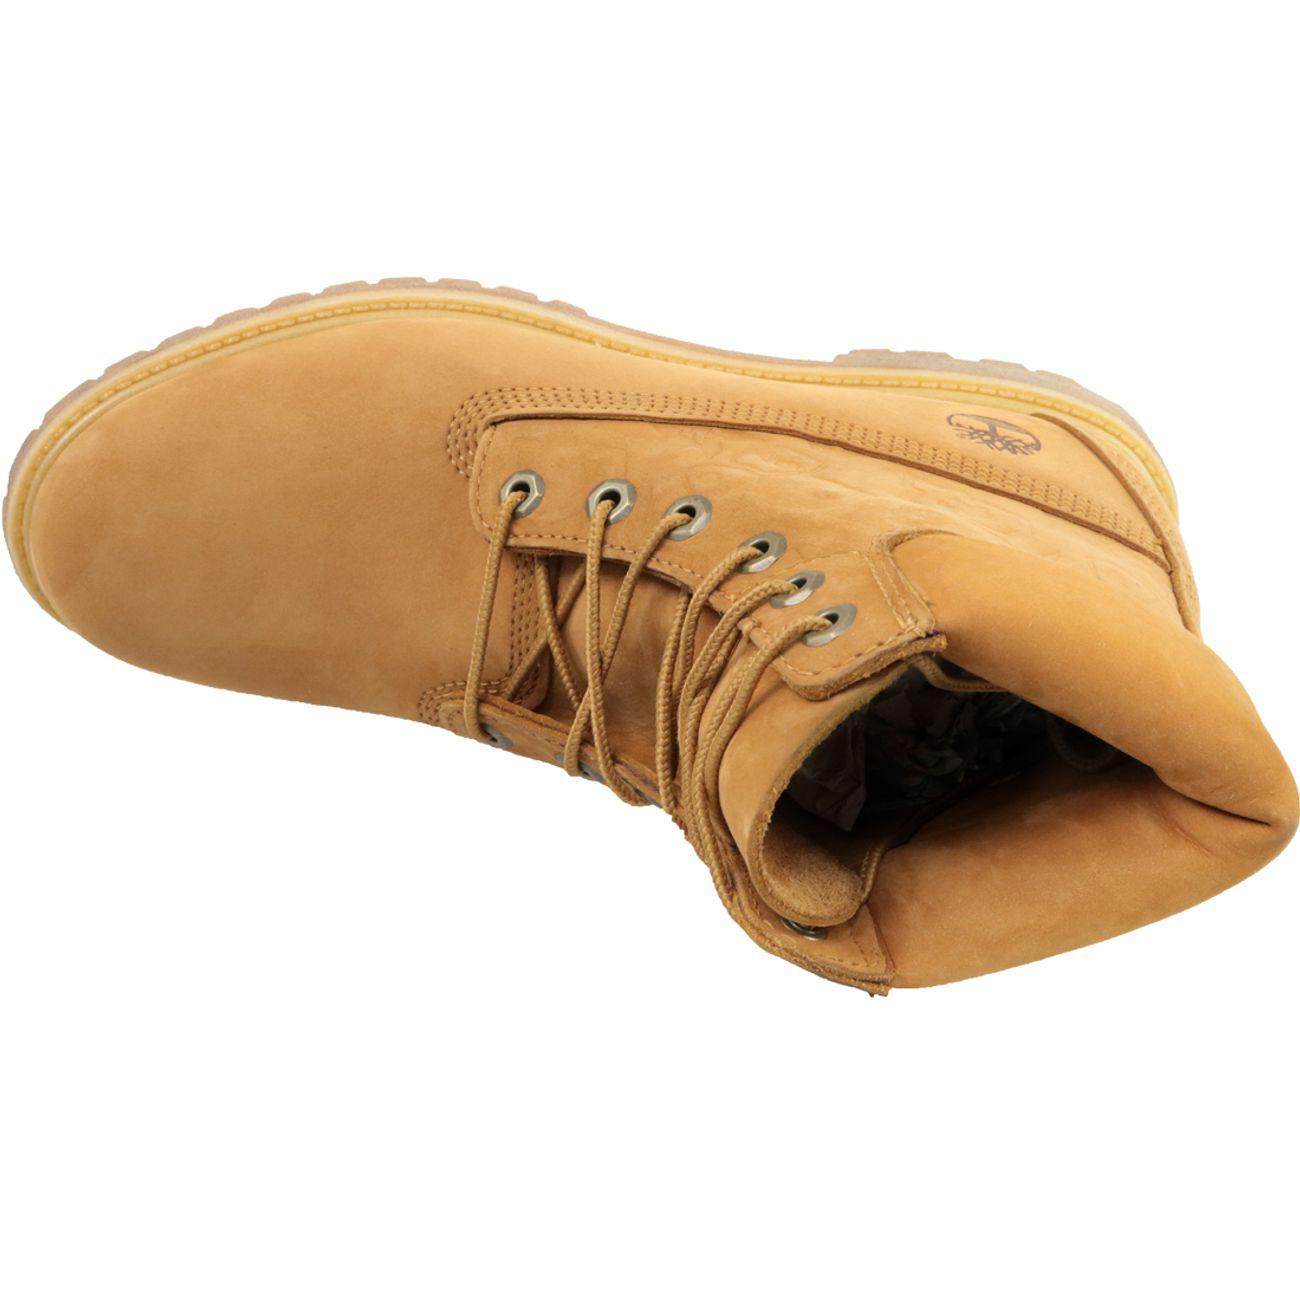 Sports d'hiver femme TIMBERLAND Timberland 6 In Premium Boot W A1K3N Femme chaussures de randonnee Marron